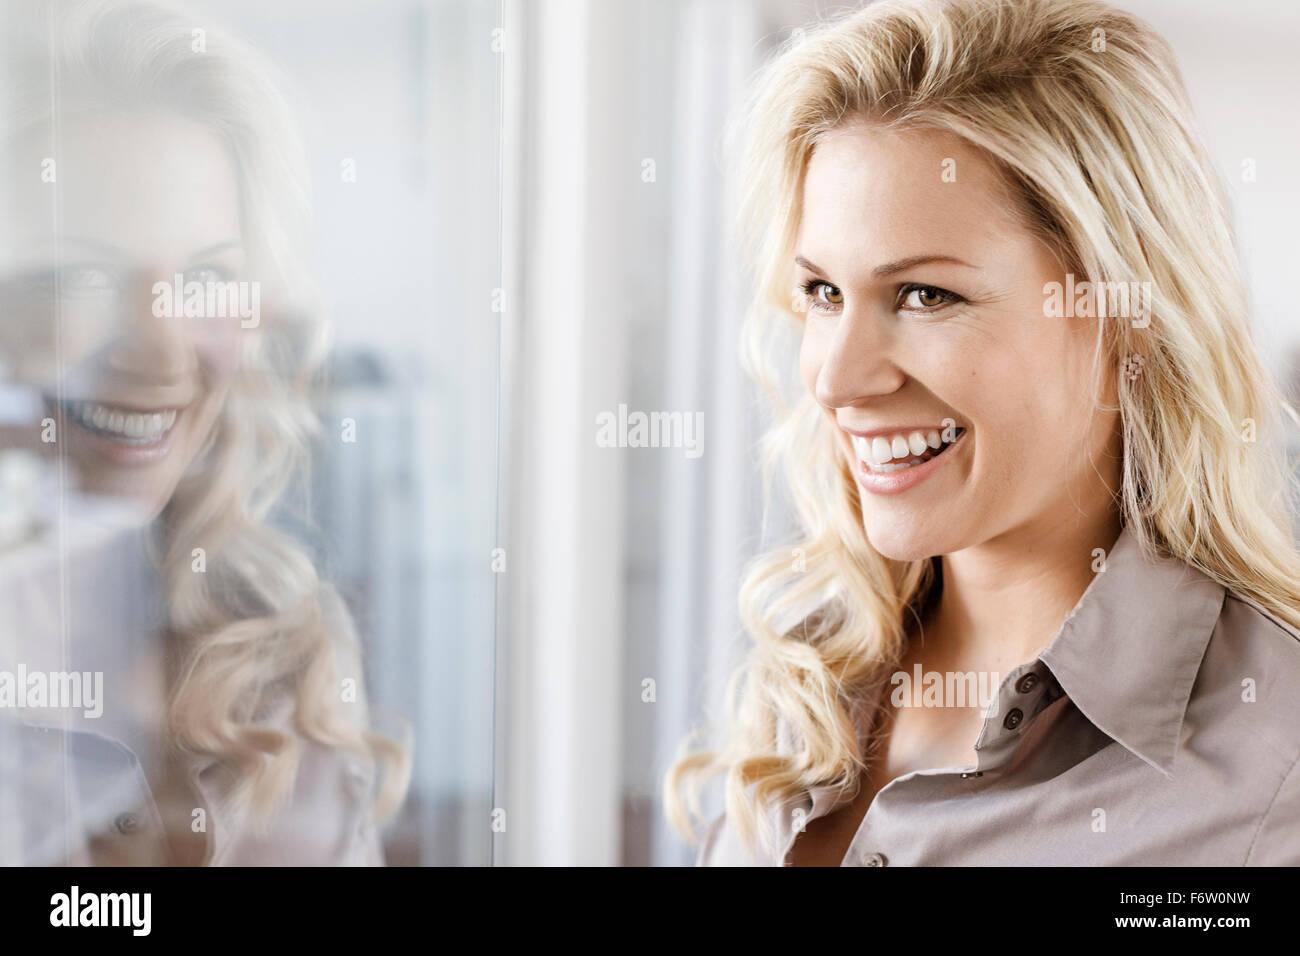 Smiling woman looking through glass pane - Stock Image